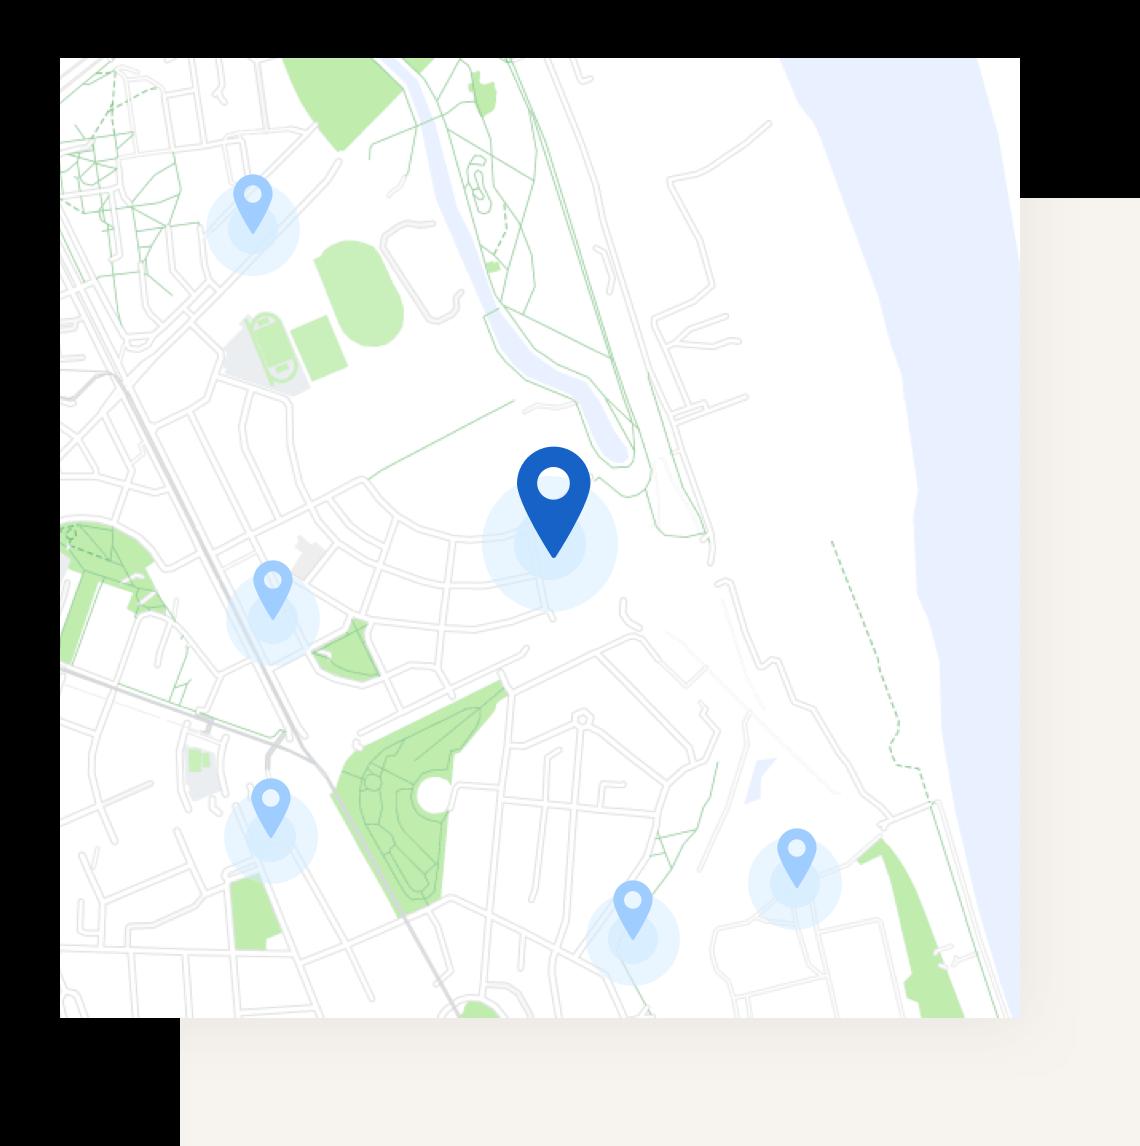 image-map